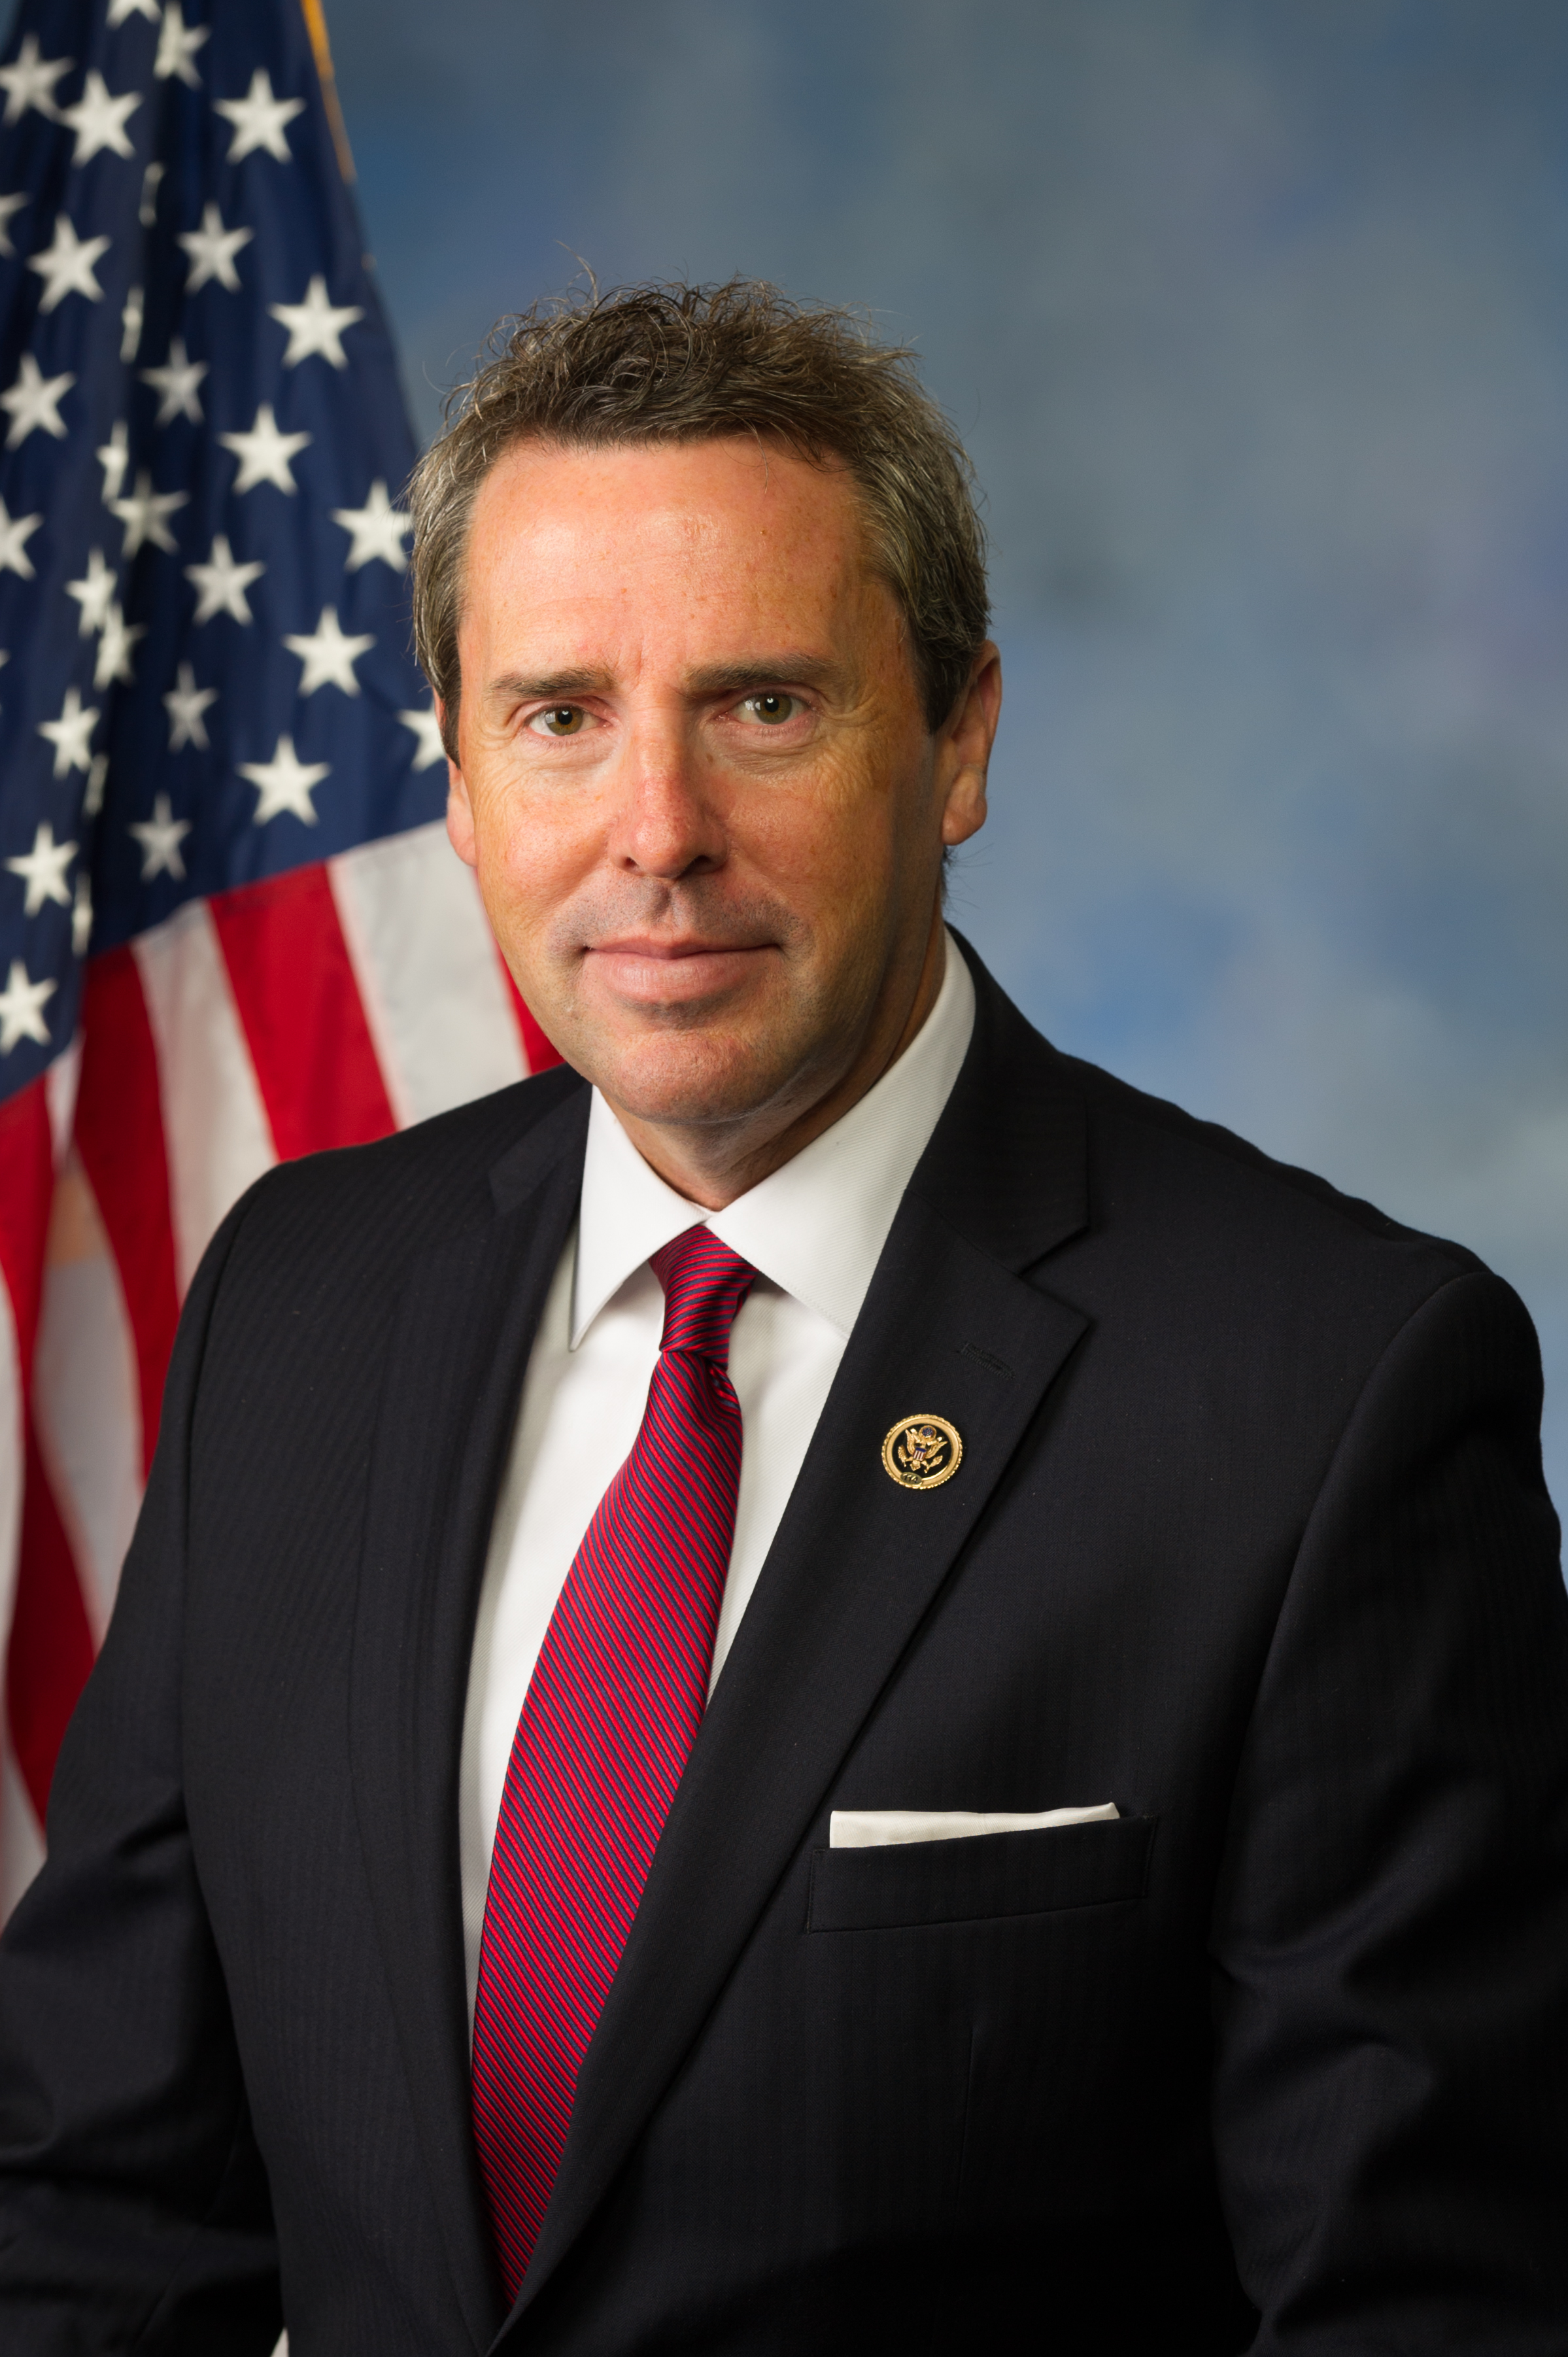 Mark Walker North Carolina Politician Wikipedia